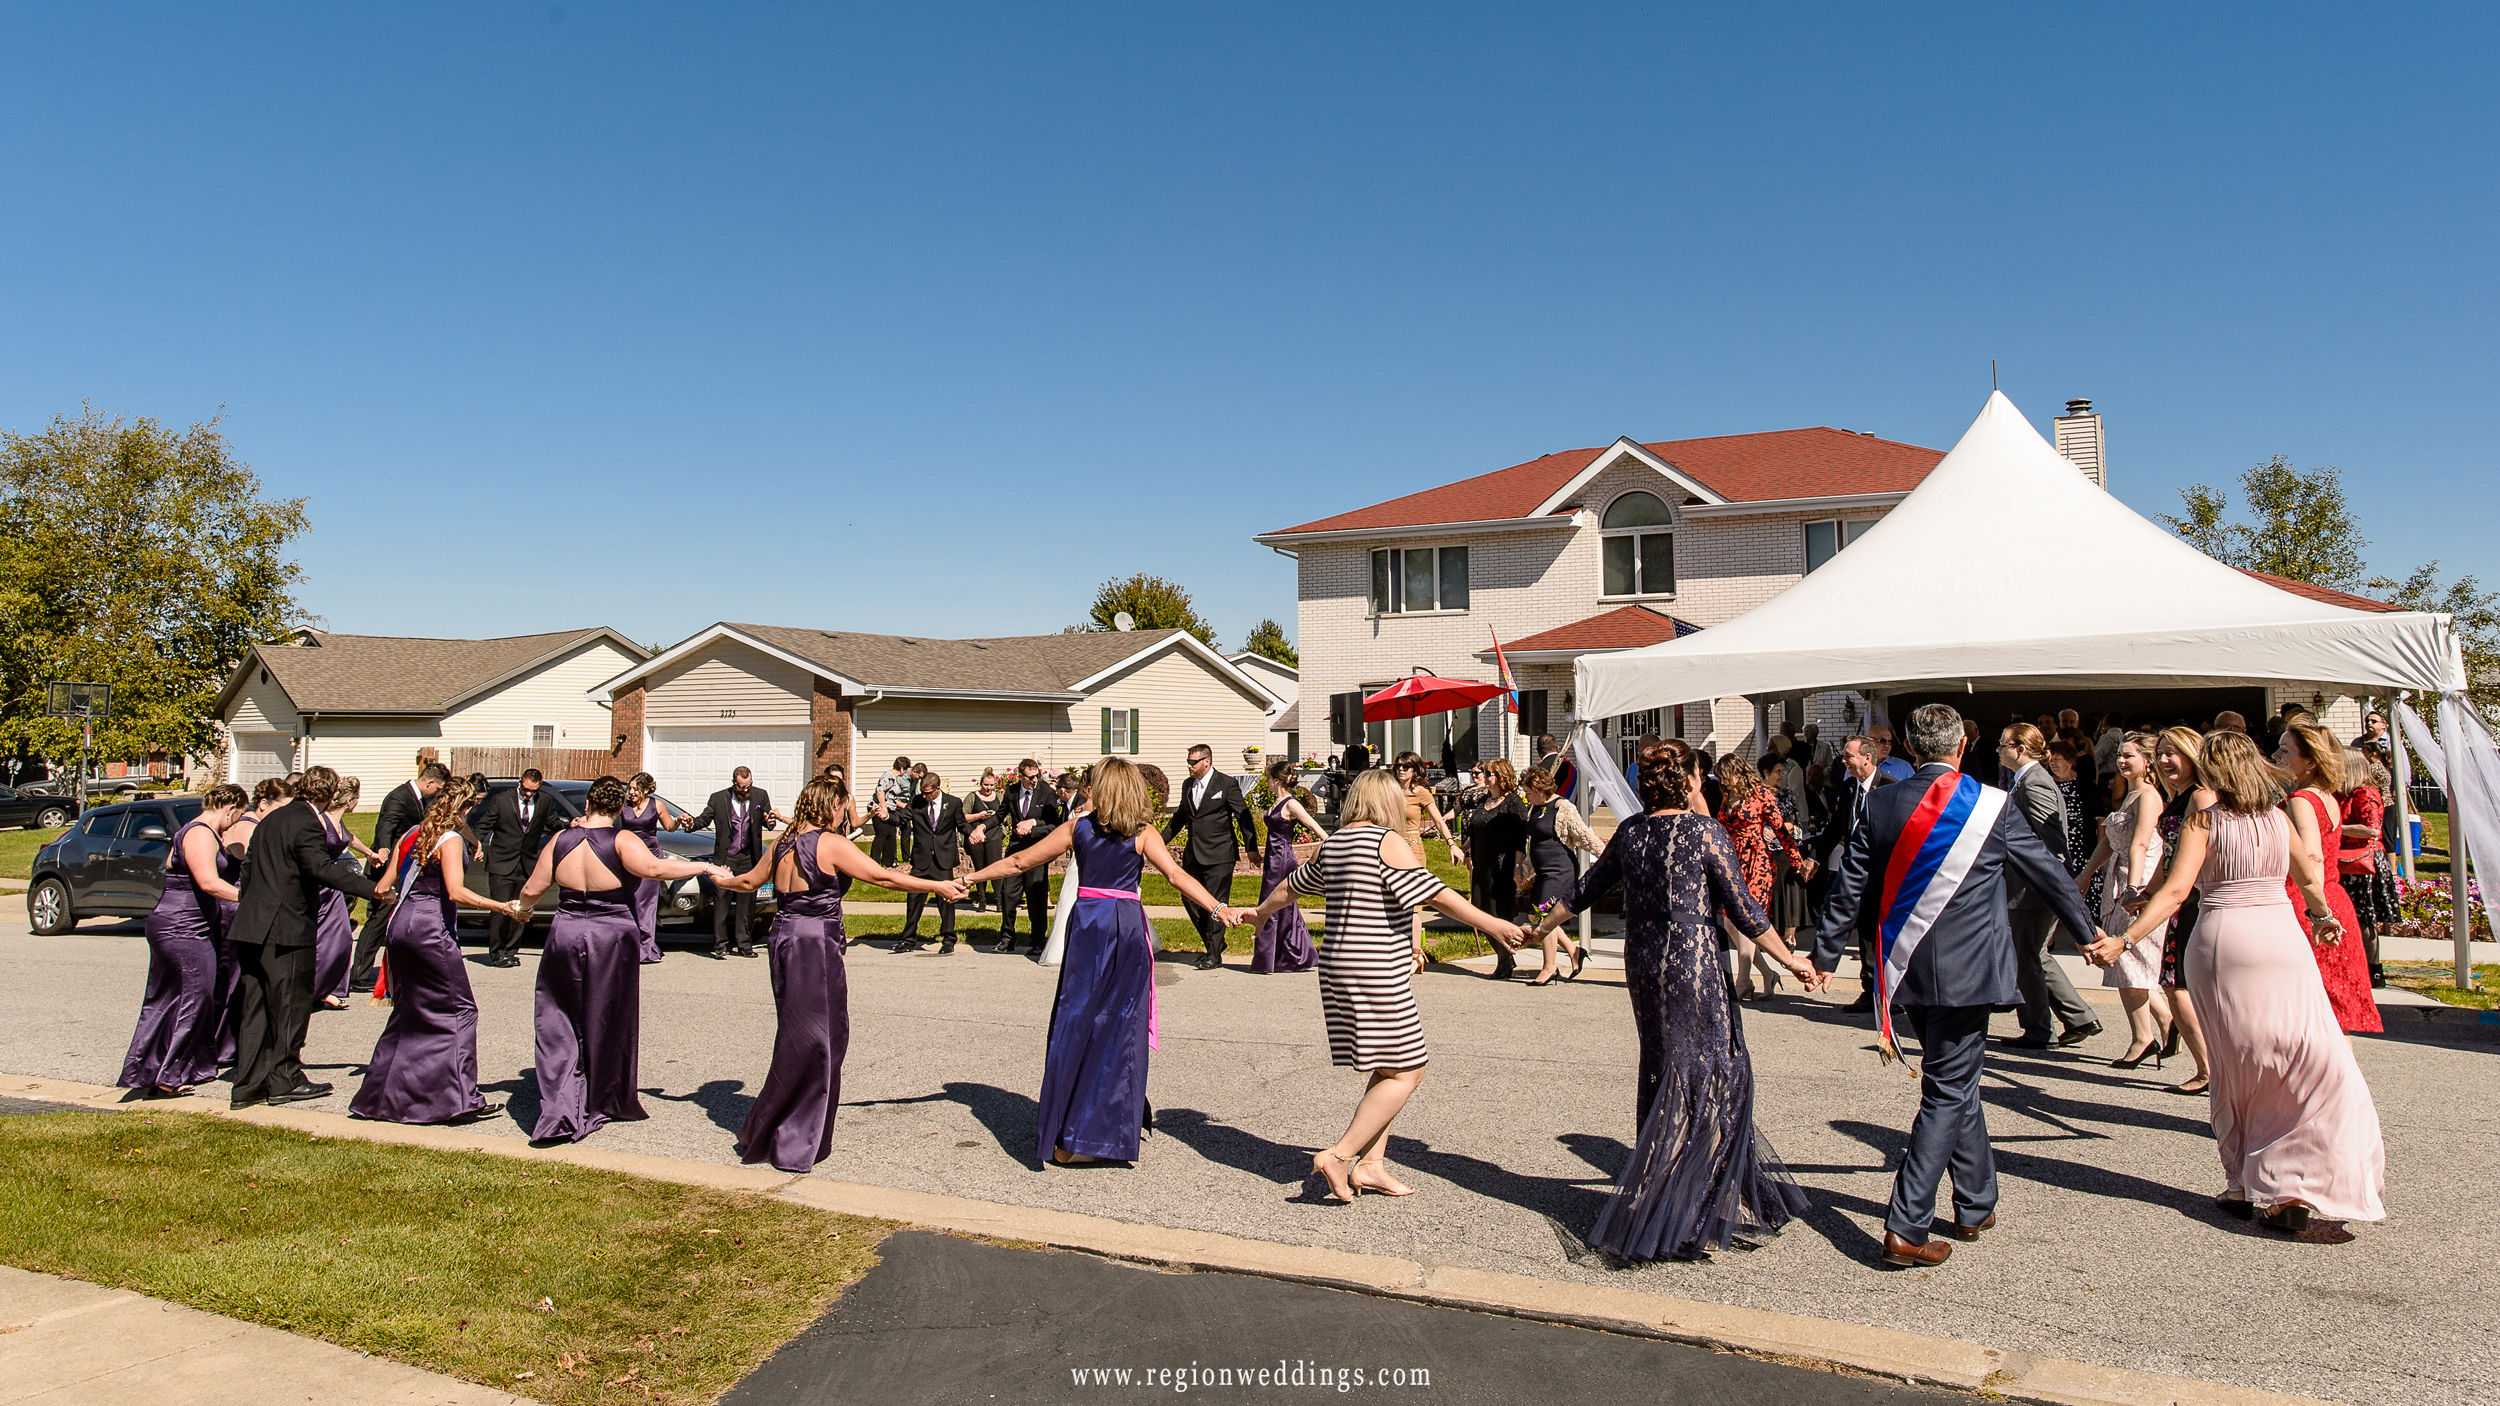 Circle of life celebration dance at a Serbian wedding.